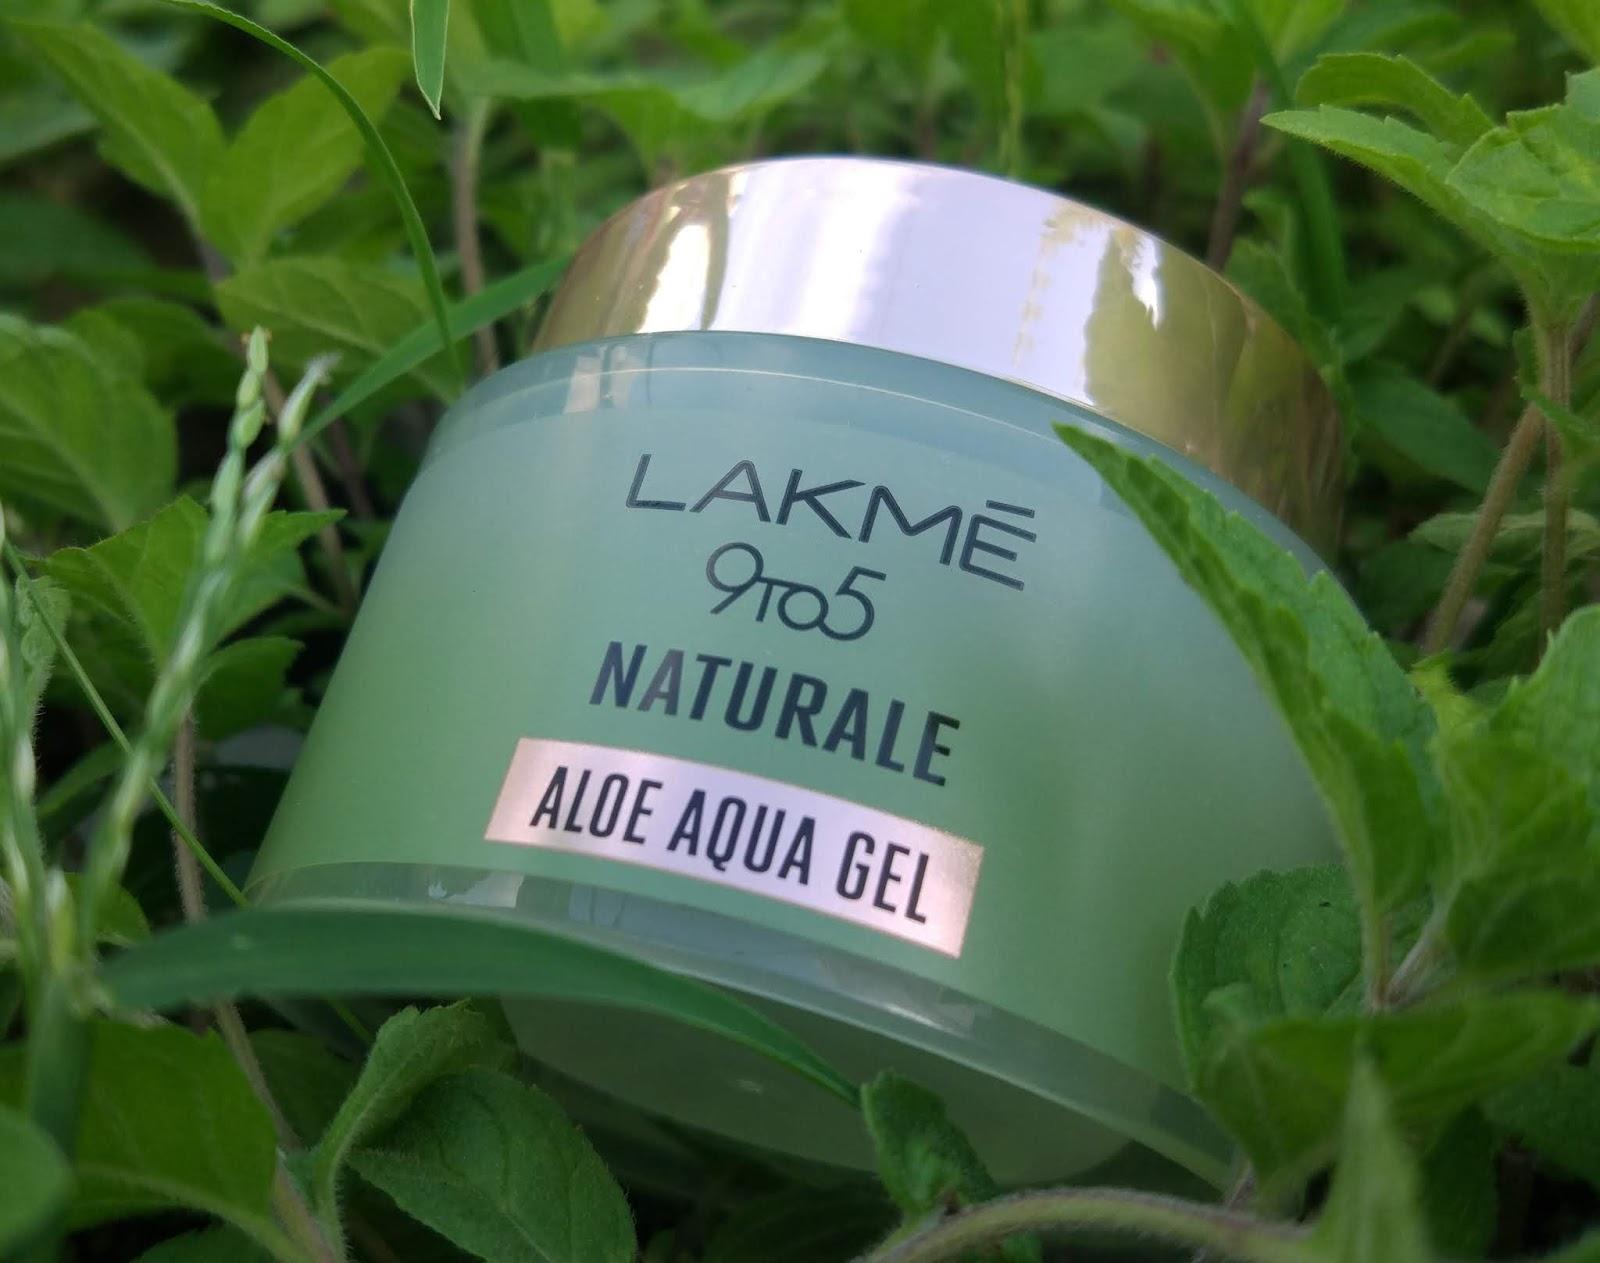 Lakme 9 To 5 Naturale Aloe Aqua Gel Review Peachypinkpretty